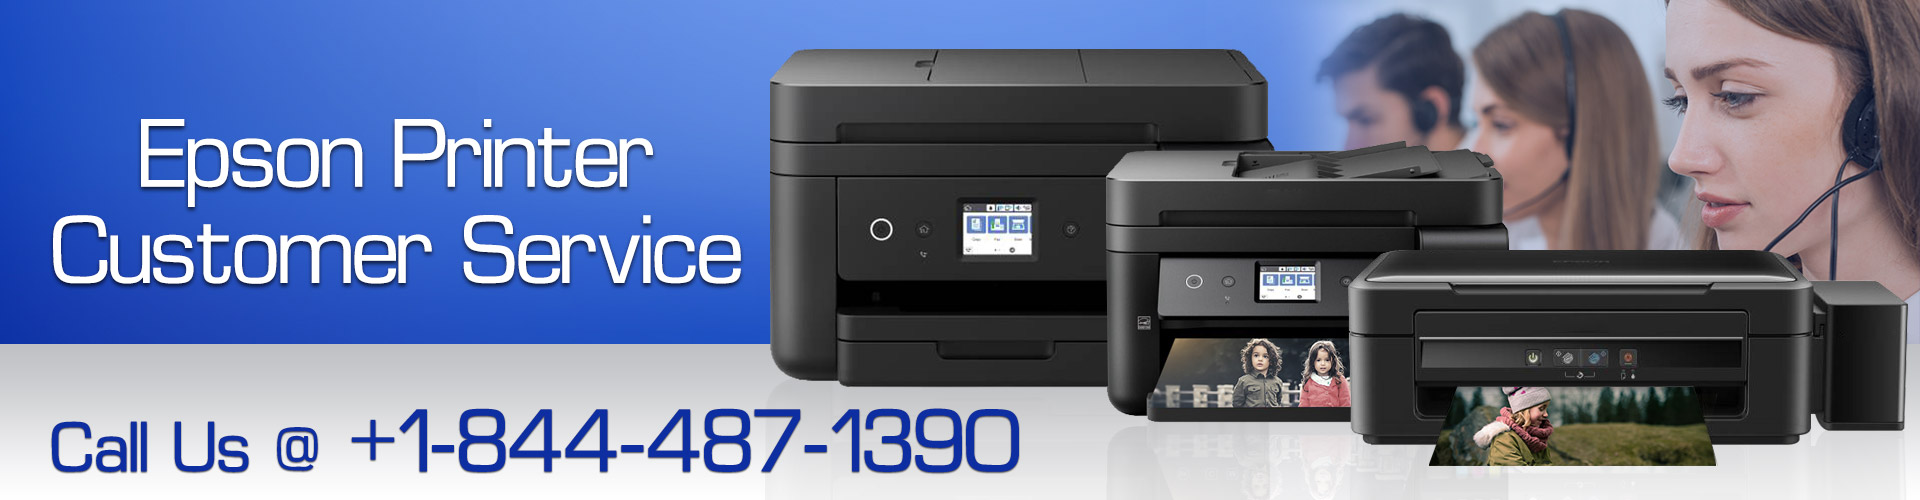 Epson Mobile Printing